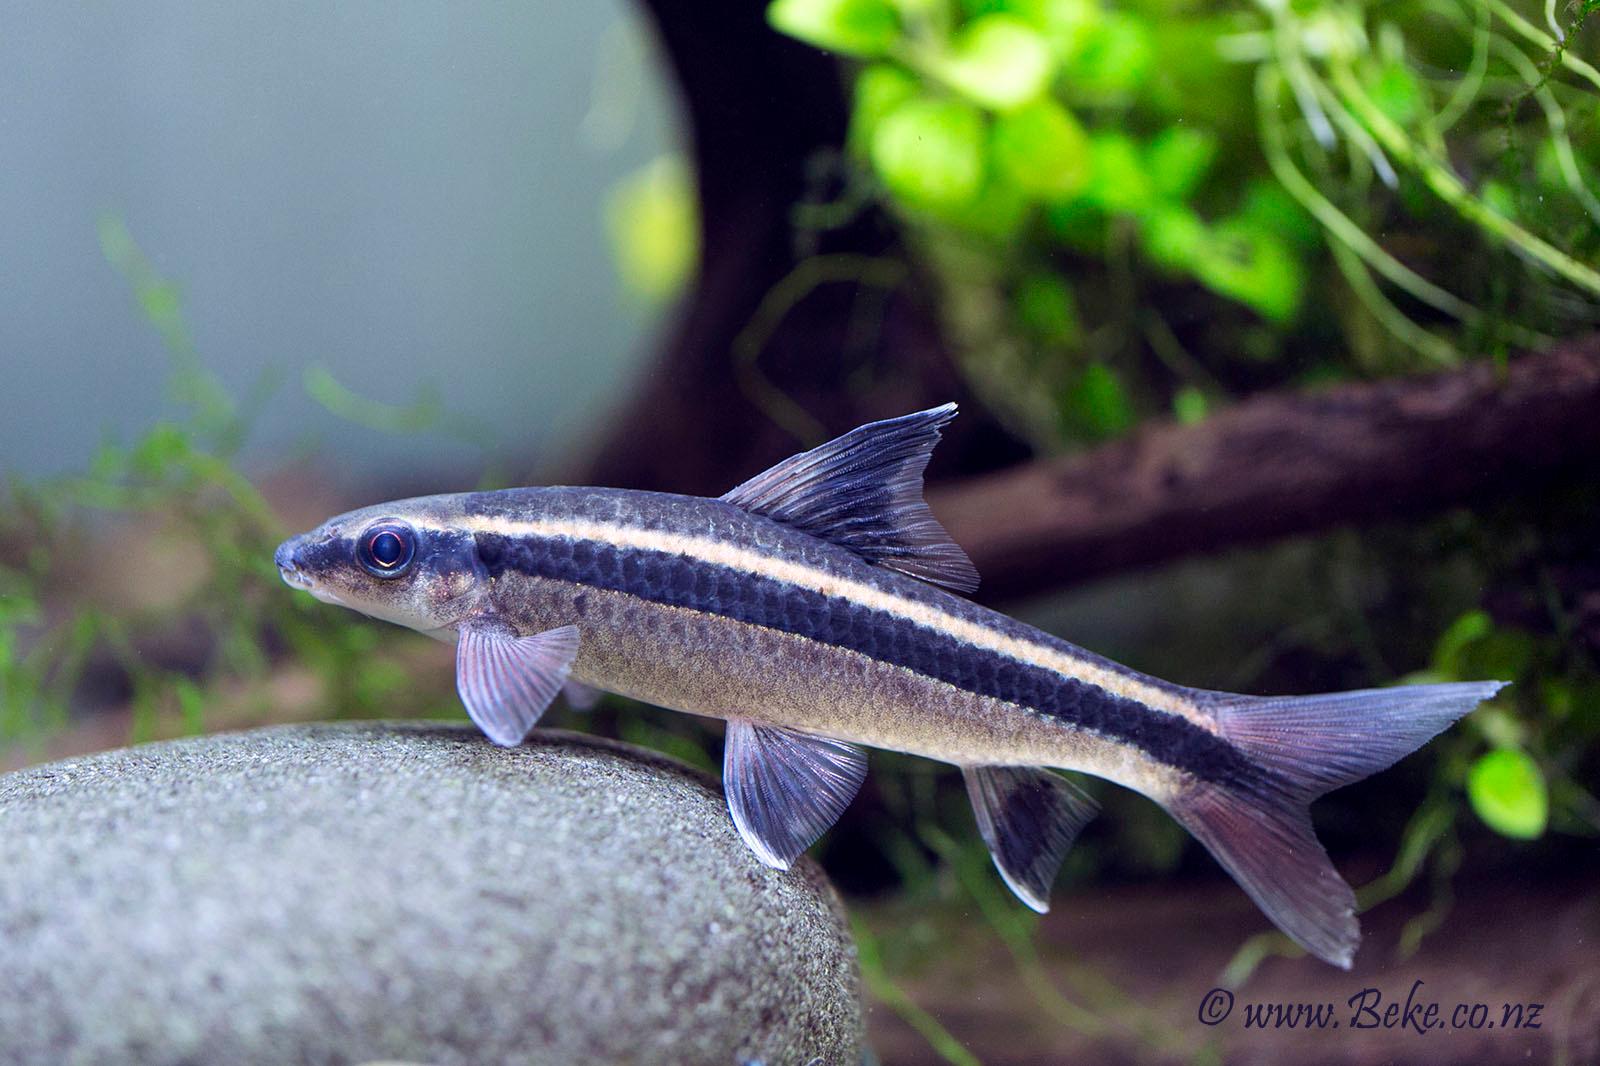 Pin By Kathy Sacksteder On Tanked Fish Aquarium Fish Fish Pet